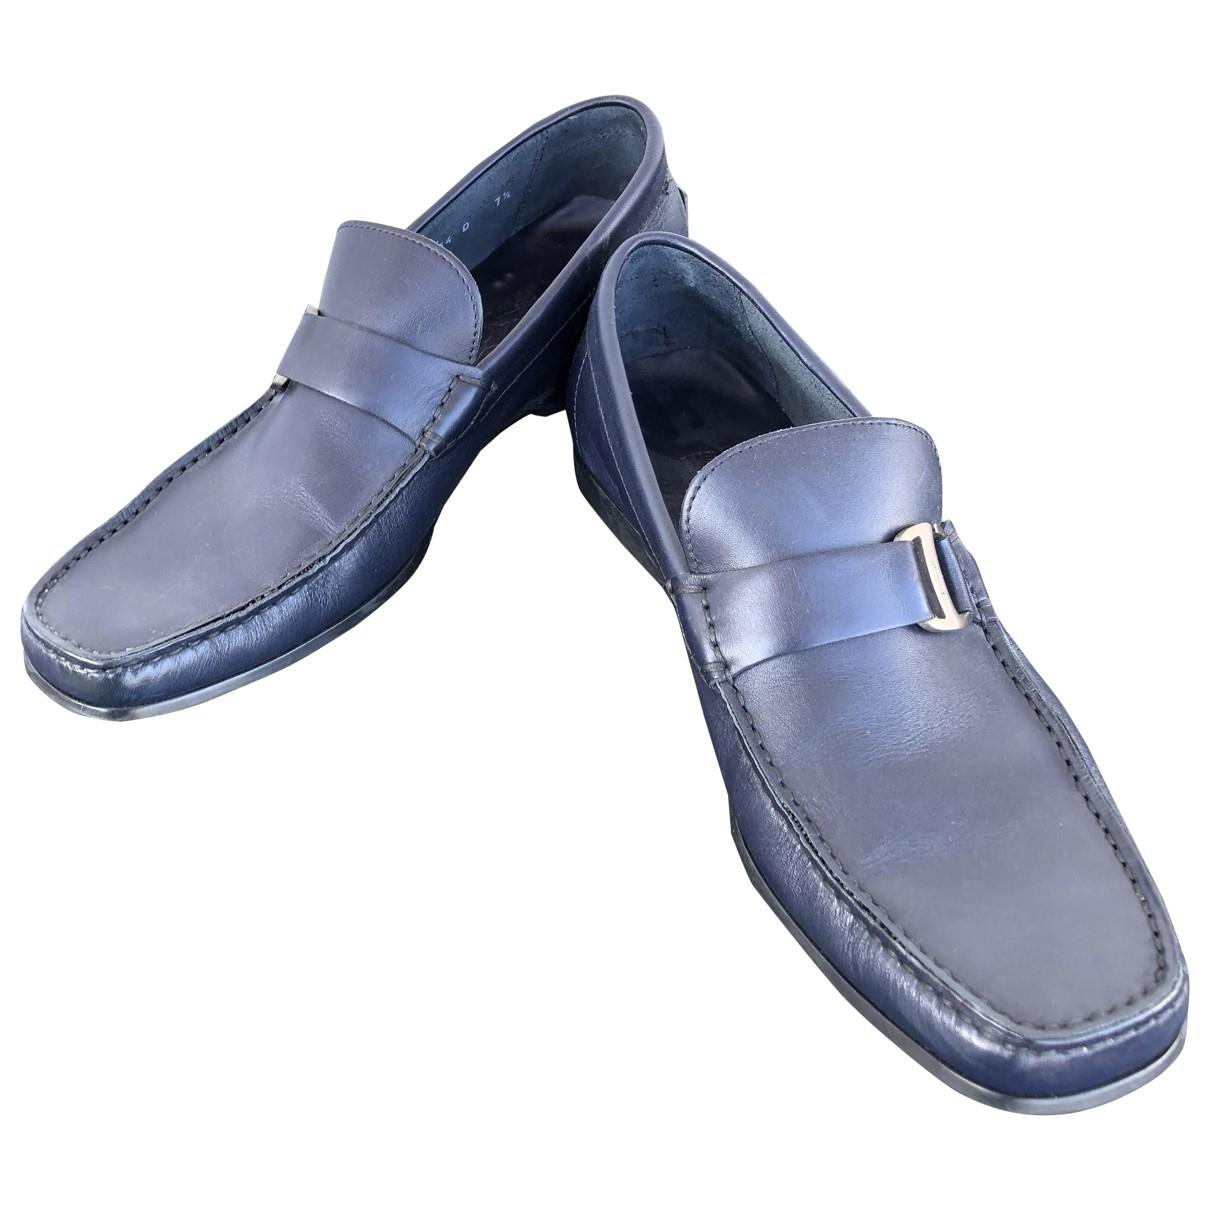 Salvatore Ferragamo \N Blue Leather Flats for Men 40.5 EU